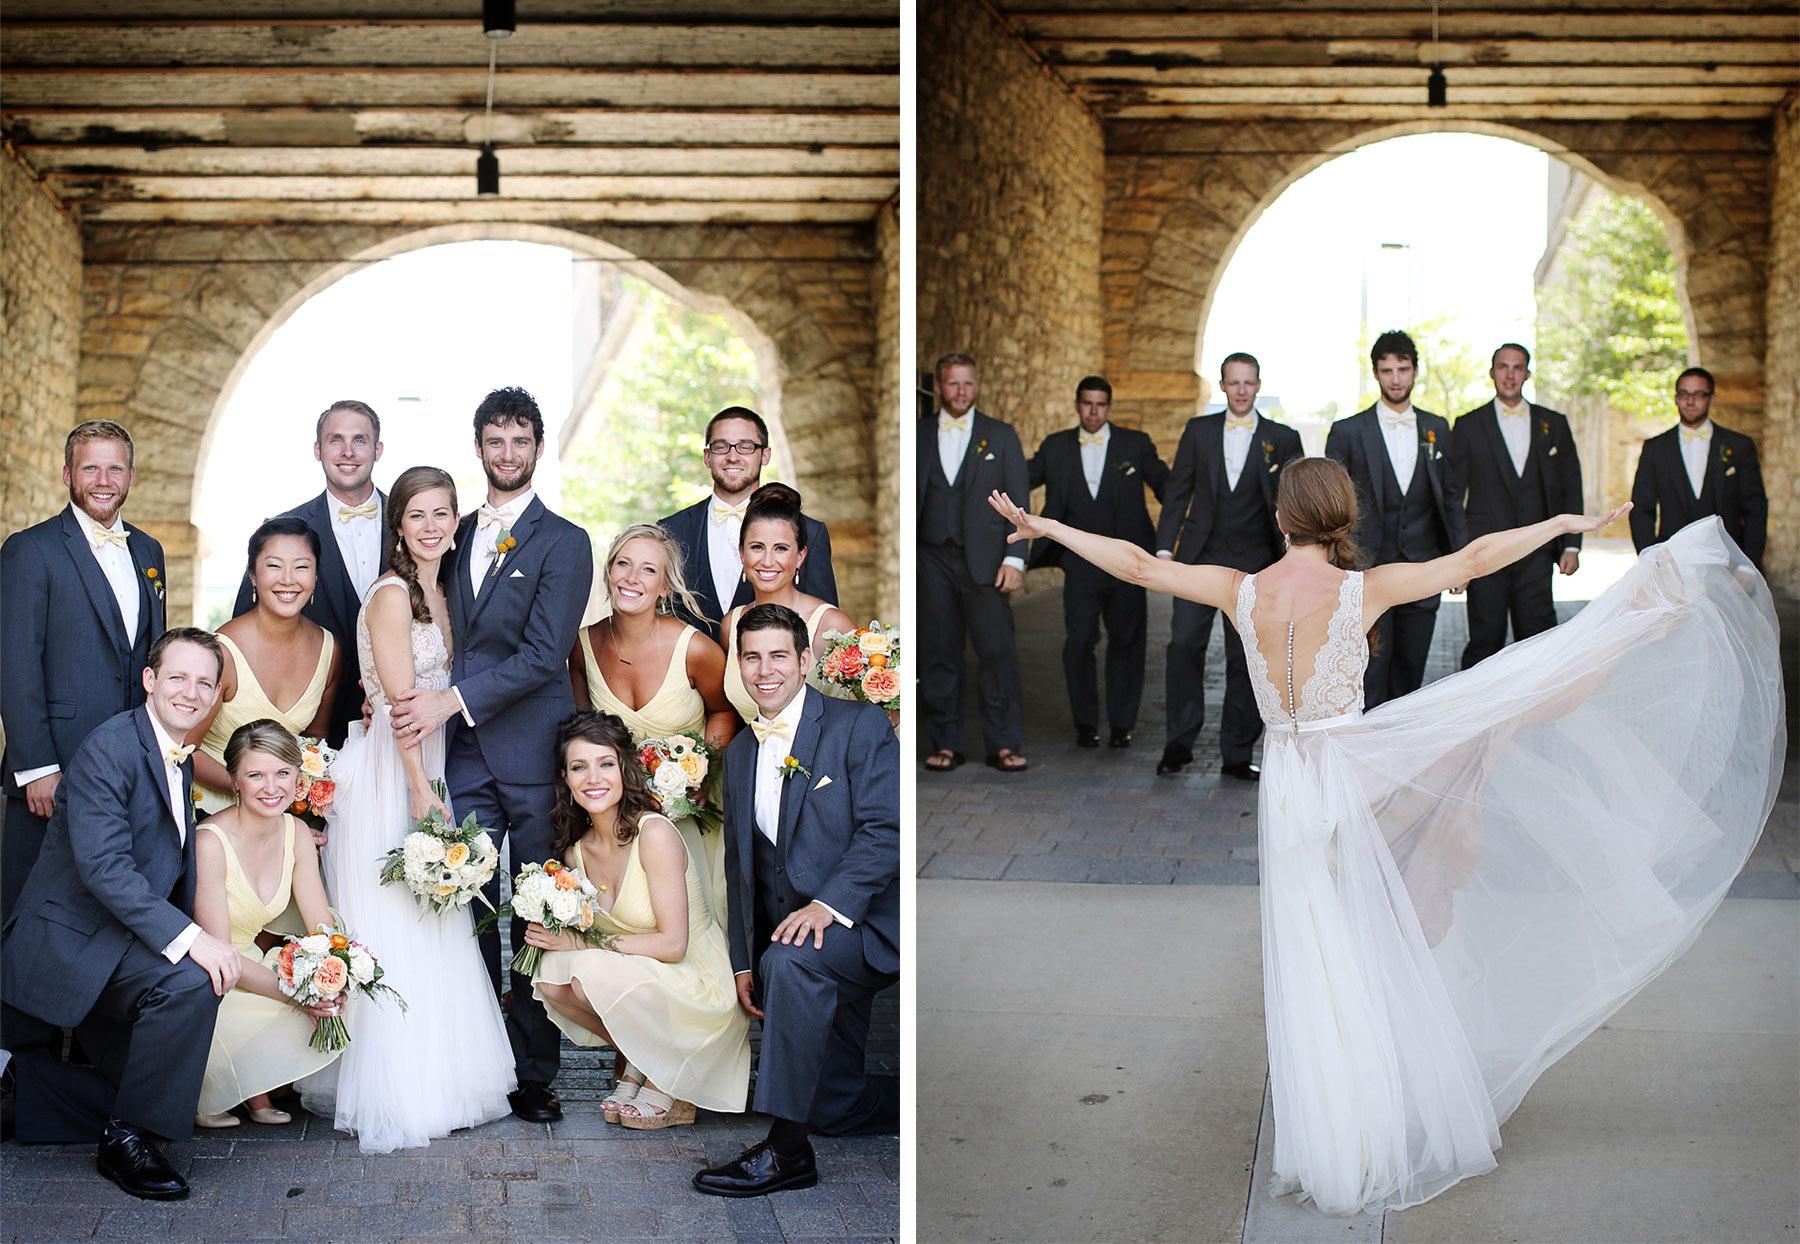 10-Minneapolis-Minnesota-Wedding-Photography-by-Vick-Photography-Downtown-Wedding-Party-Group-Sarah-&-Tom.jpg